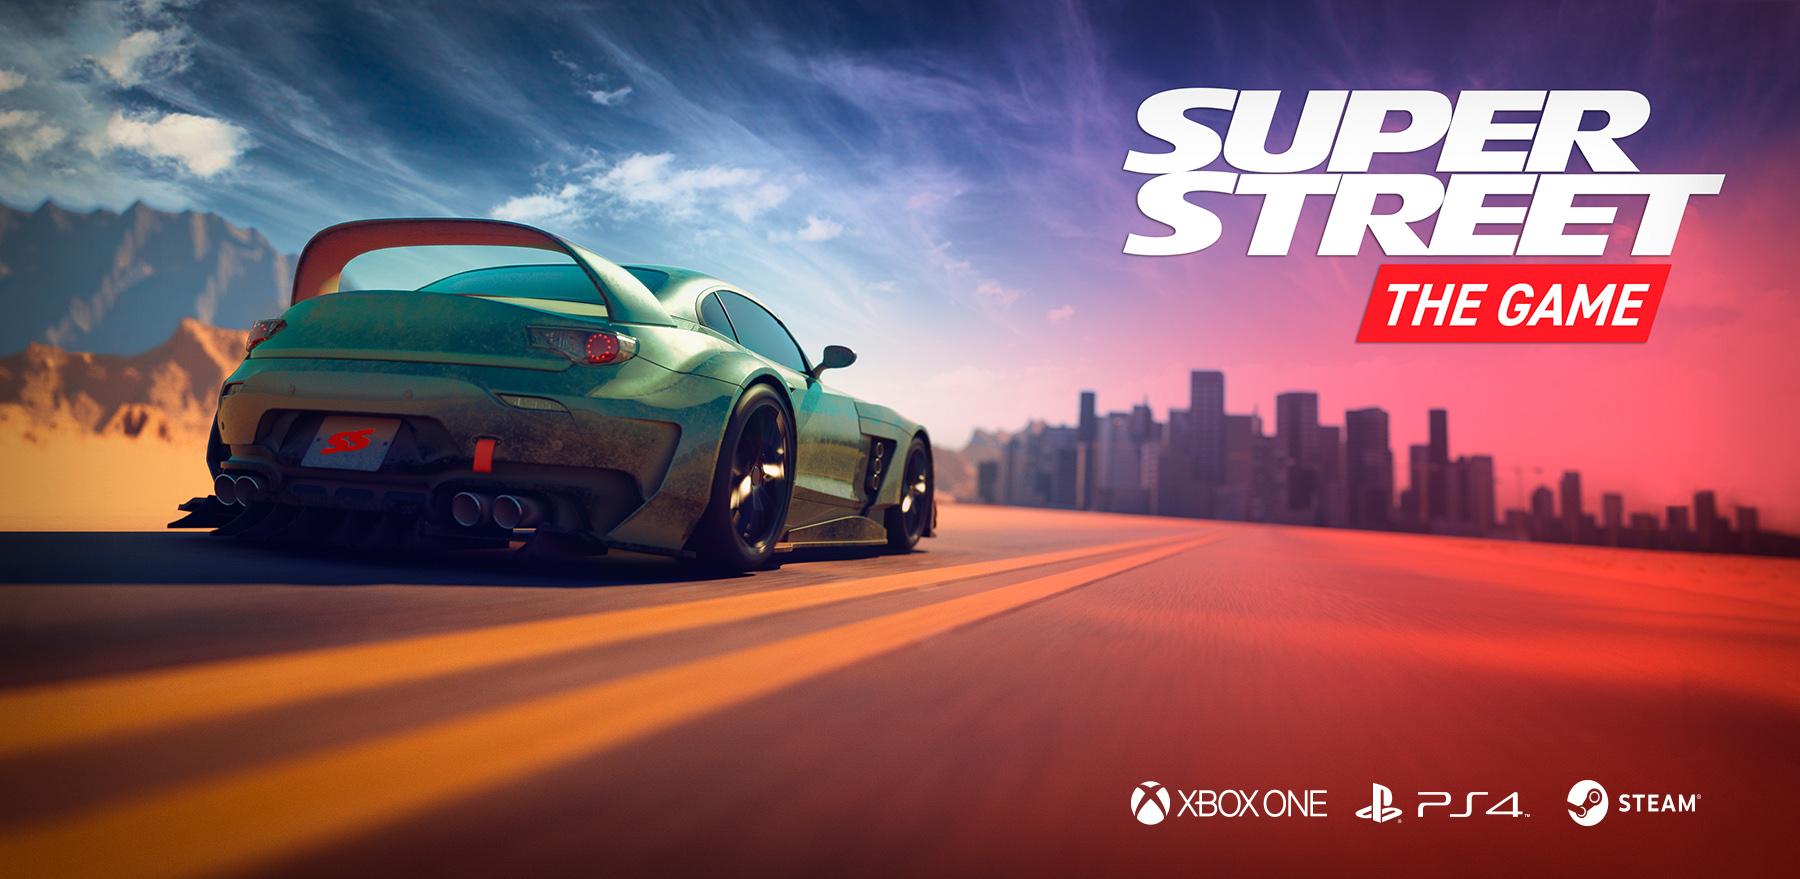 Super Street The Game - Super Street: The Game Арт